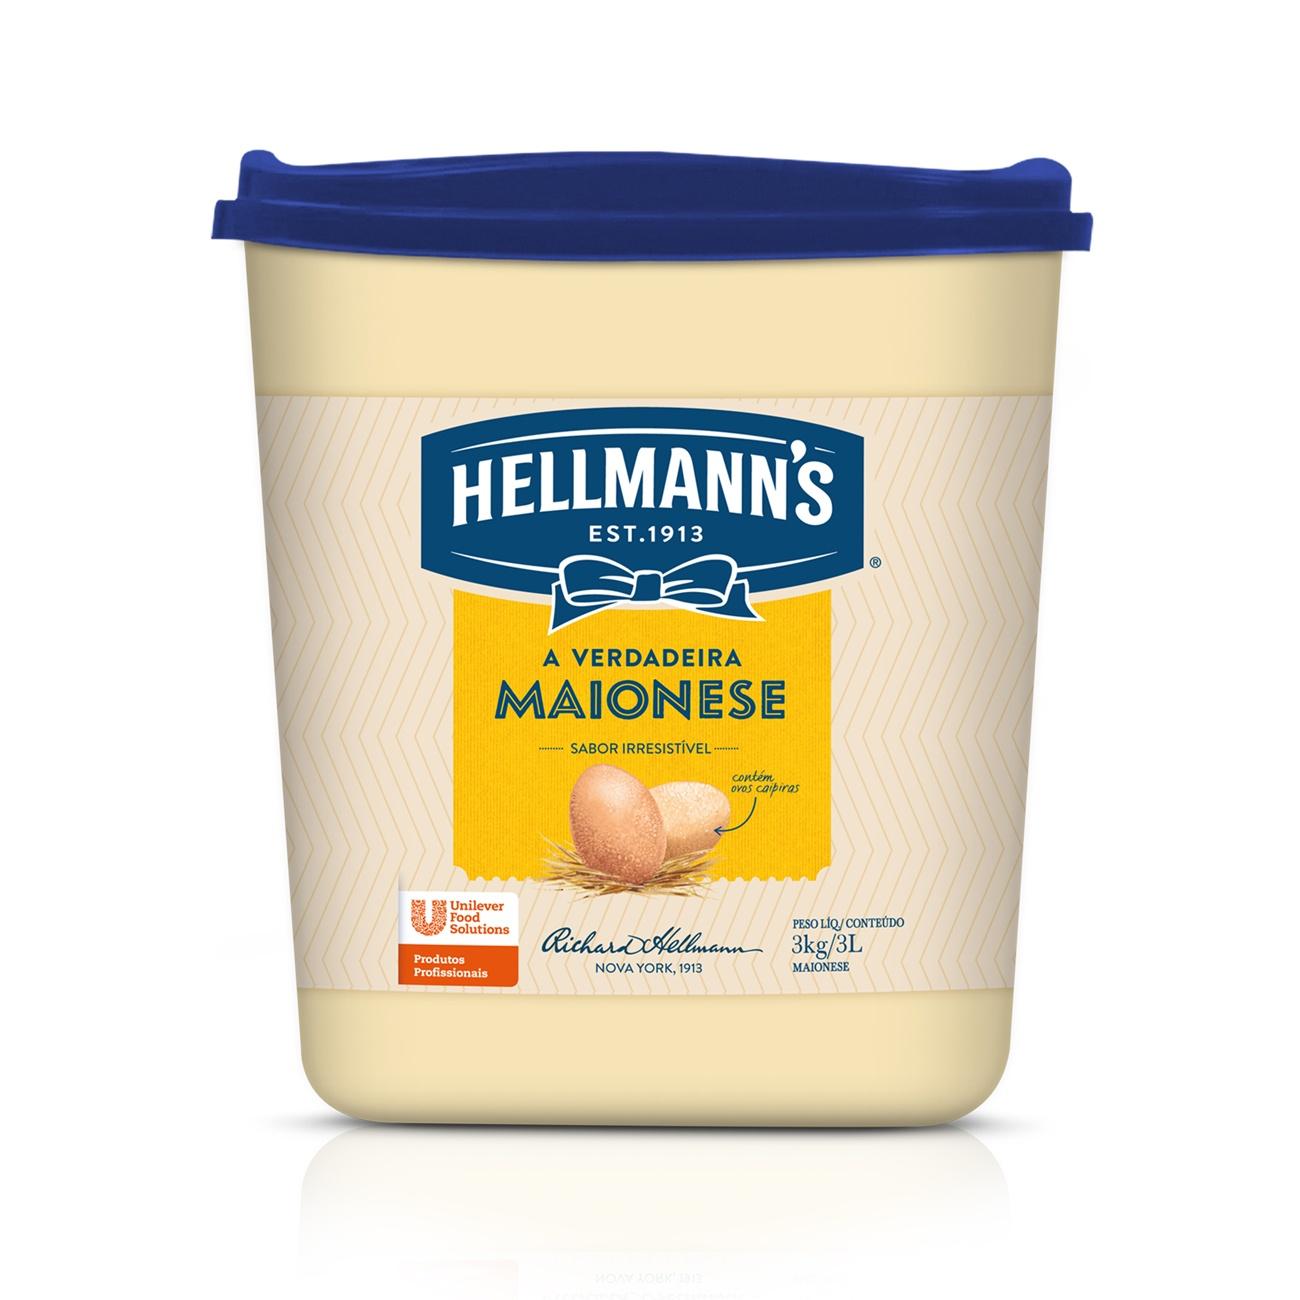 Maionese Hellmann's Balde 3kg